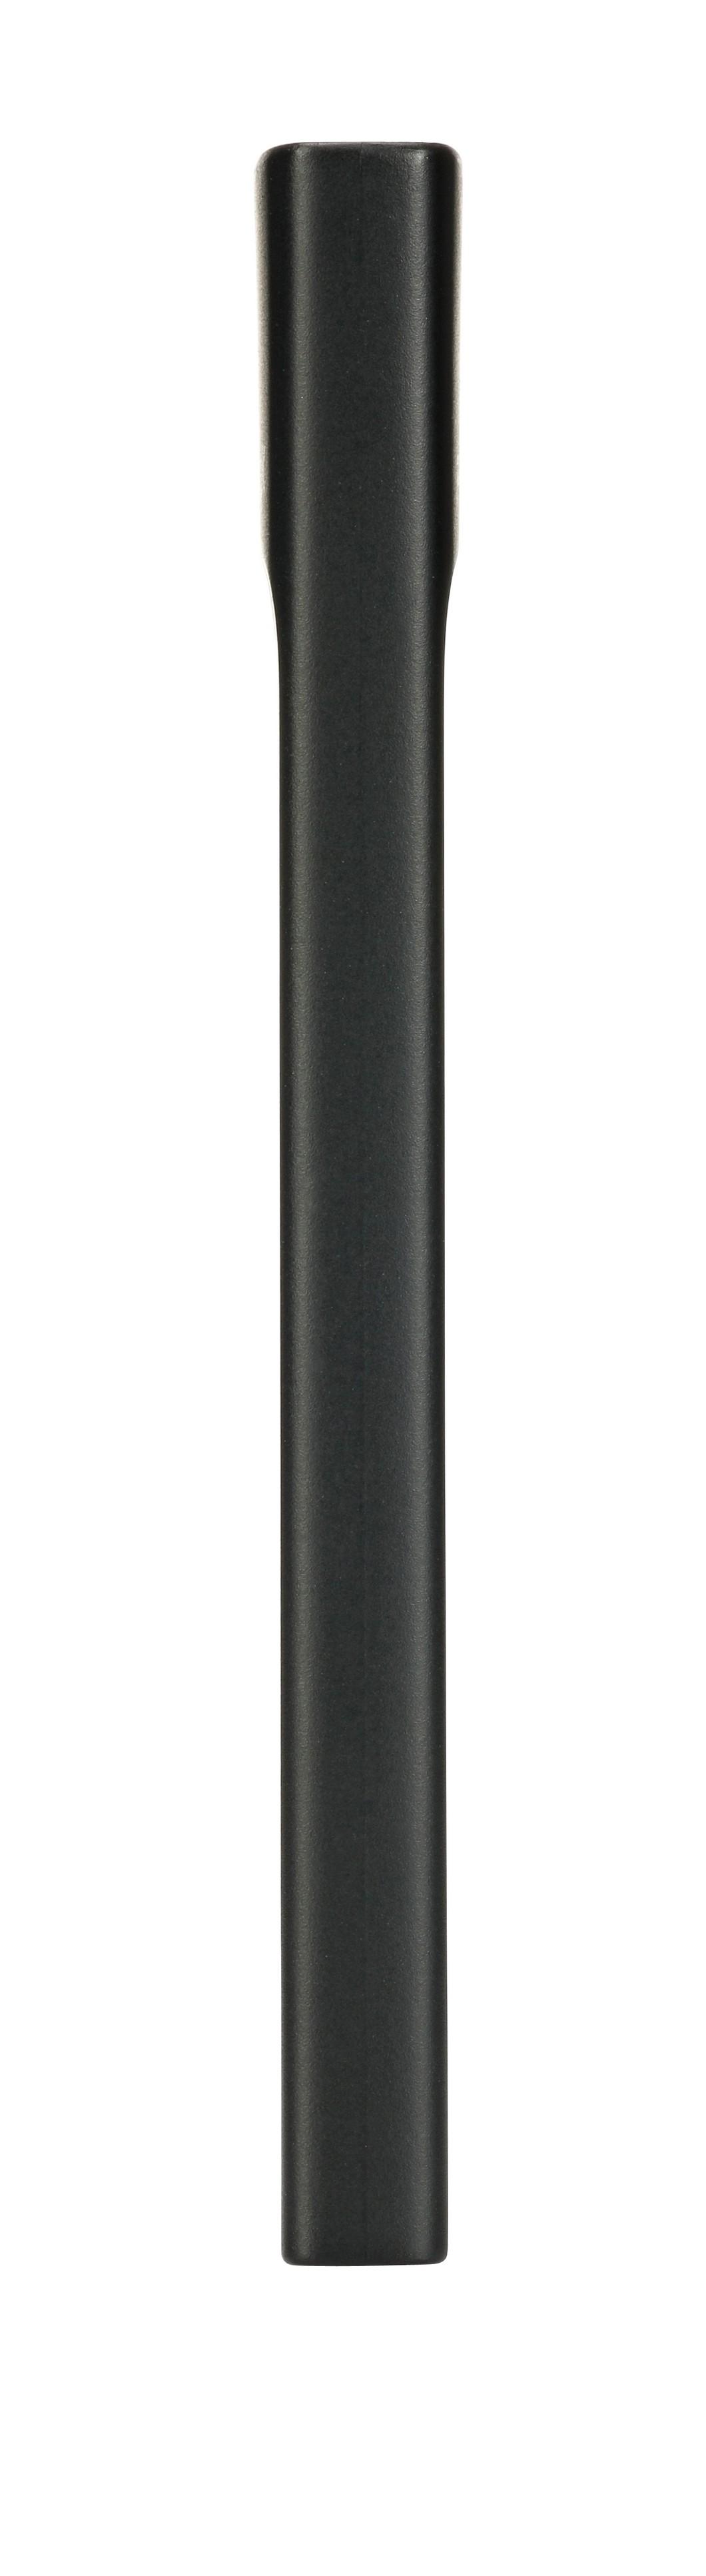 Power bank PBslim-3